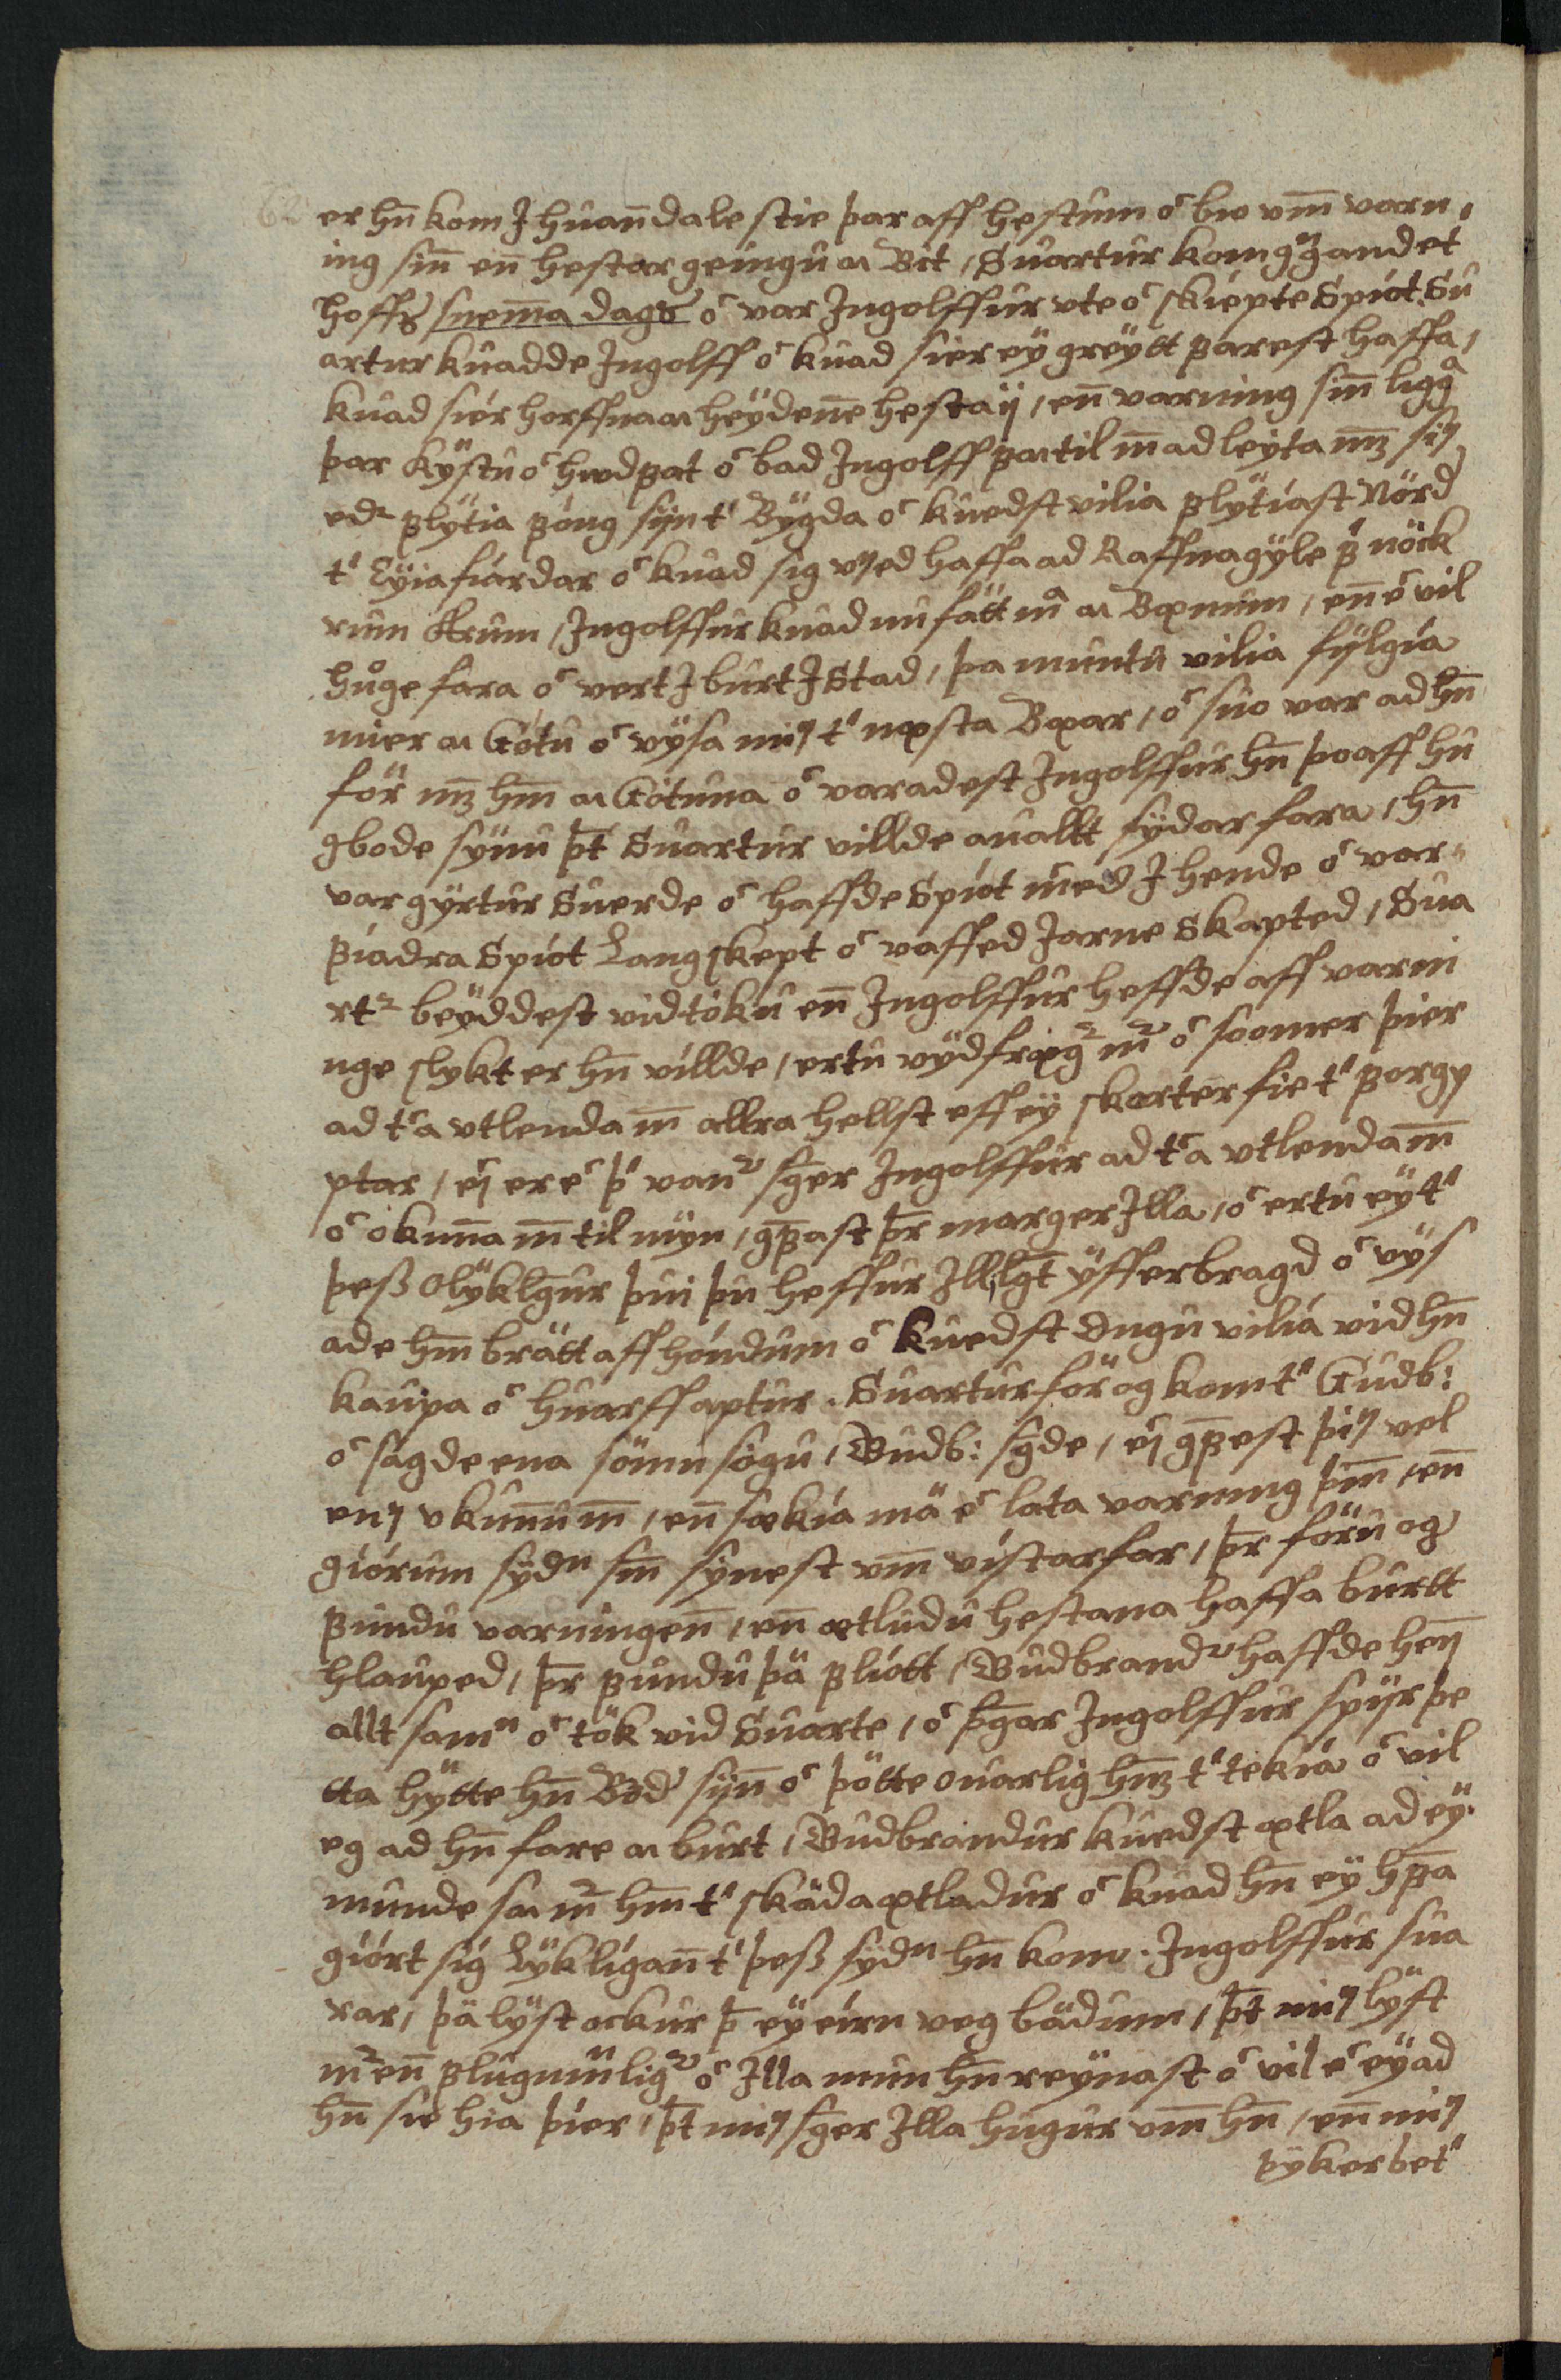 AM 138 fol - 31v